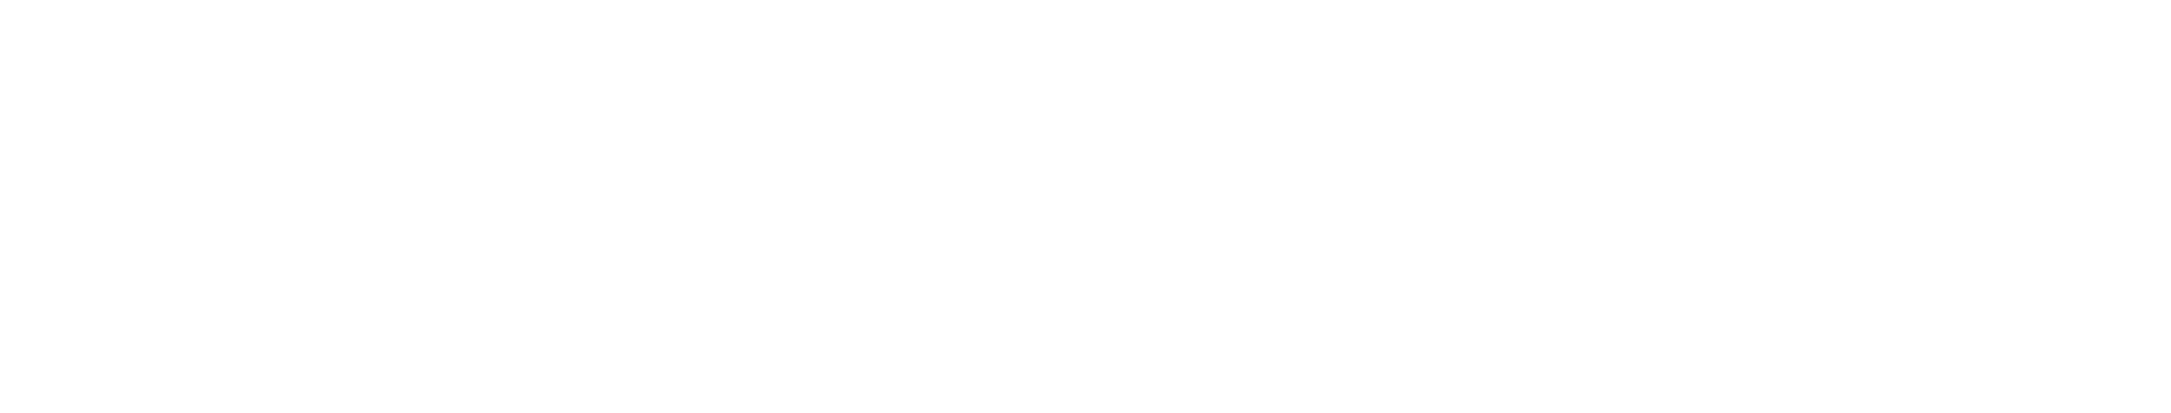 Kunstwerkstatt Tulln